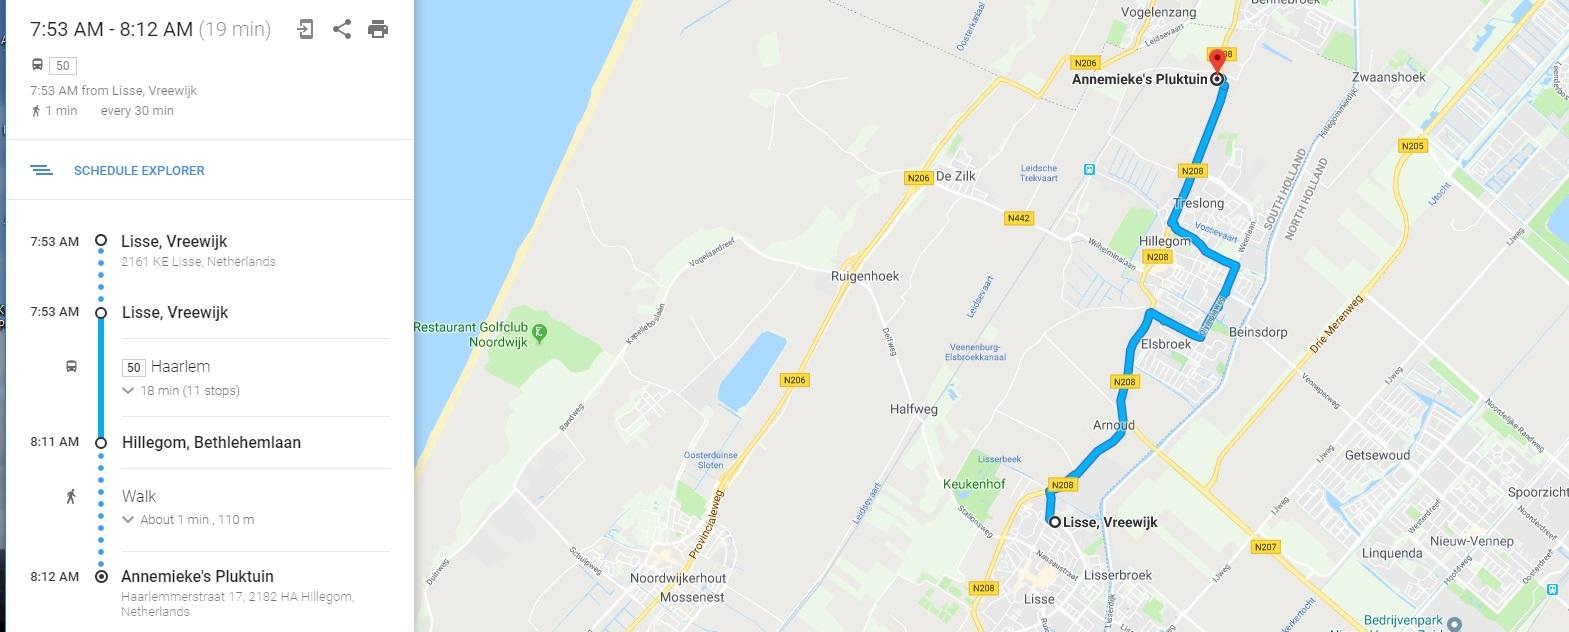 Picking Tulips Near Keukenhof Gardens - Almere Tours on netherlands holland map, giethoorn holland map, zeeland holland map, edam holland map, maastricht holland map, amersfoort holland map, scheveningen holland map, amsterdam holland map, arnhem holland map, rotterdam holland map, europe holland map, leiden holland map, utrecht holland map, nijmegen holland map, hillegom holland map, eindhoven holland map, leeuwarden holland map, randstad holland map, delft holland map, haarlem holland map,